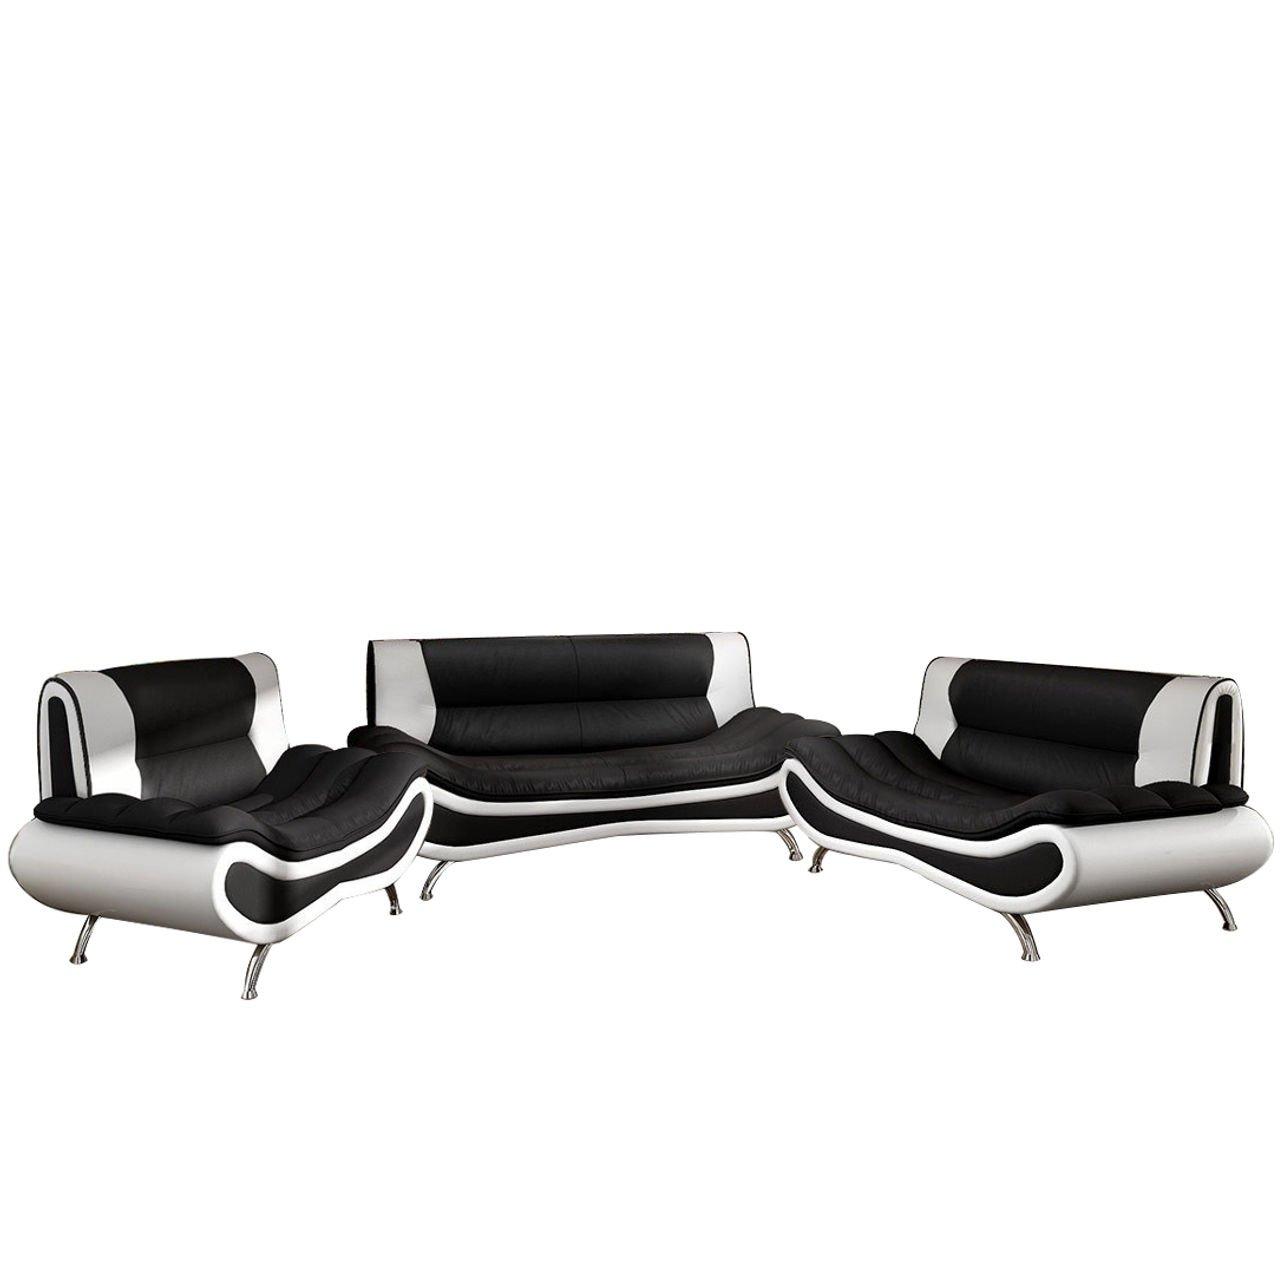 Peso 3+2+1 ! Sofagarnitur ! Moderne Sofas Sofa Couch! Große ...